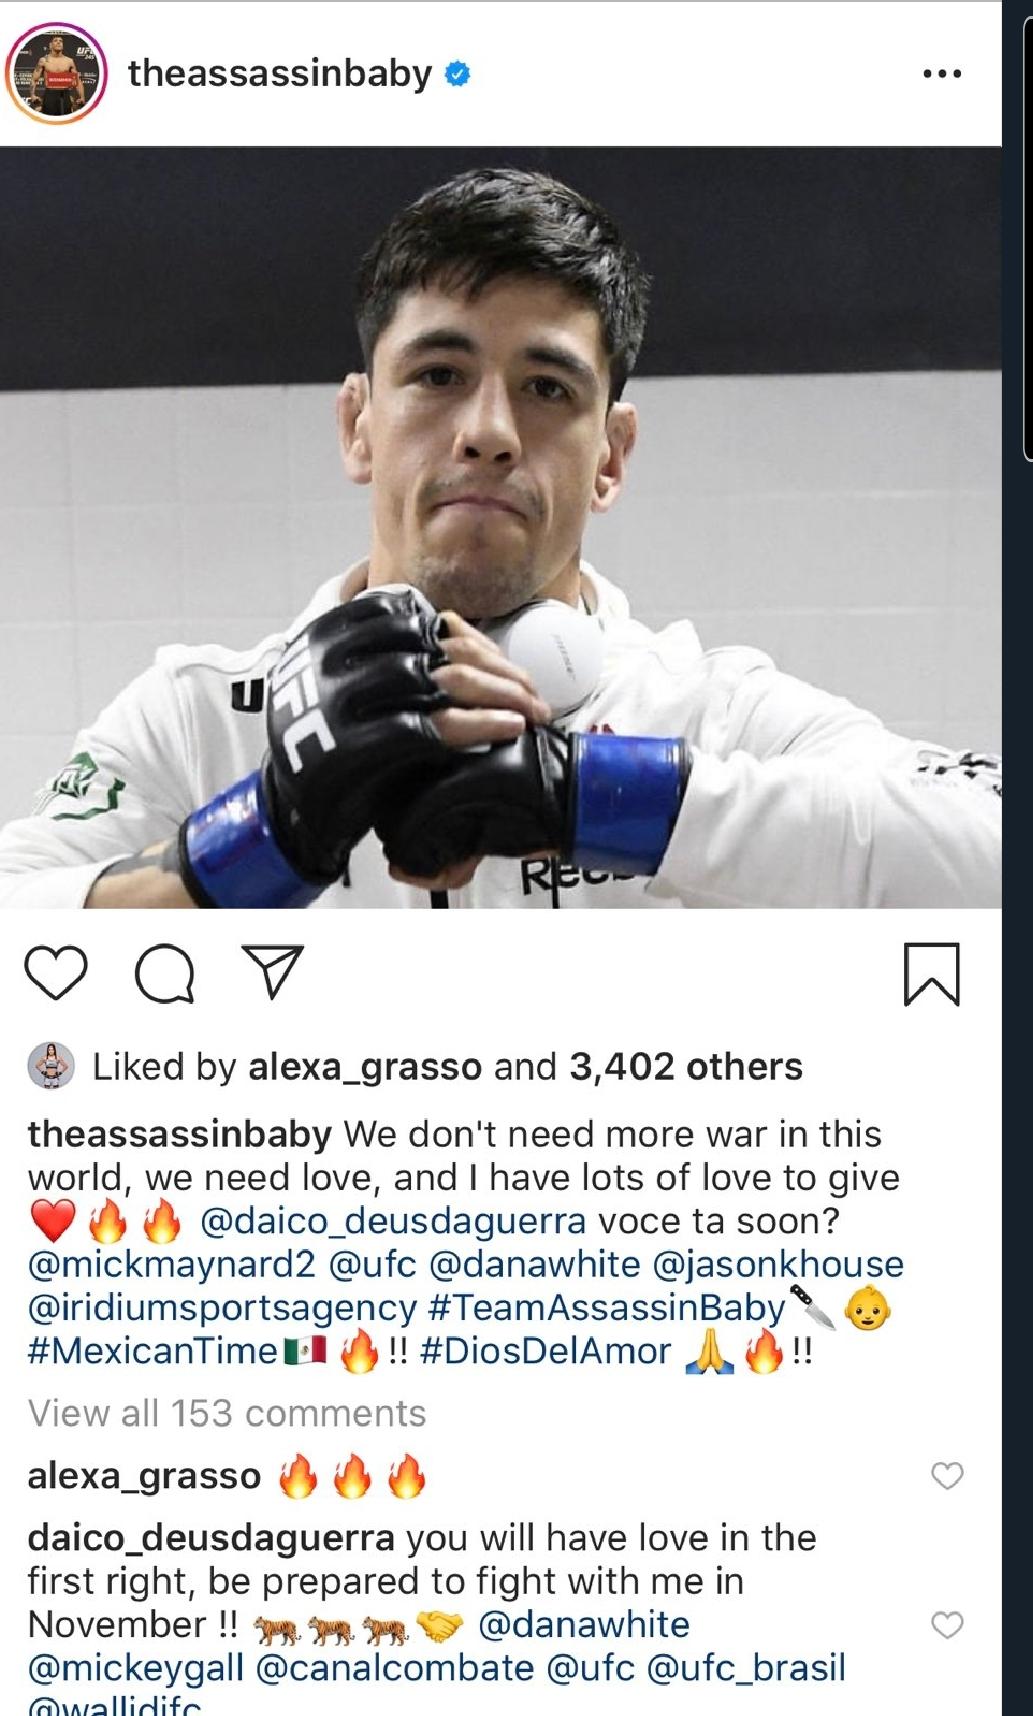 [UFC 매치업 뉴스] 코너 맥그리거와의 시합을 거절한 저스틴 게이치  브랜드 모레노의 시합 요청에 화답한 데이비슨 피게이레도